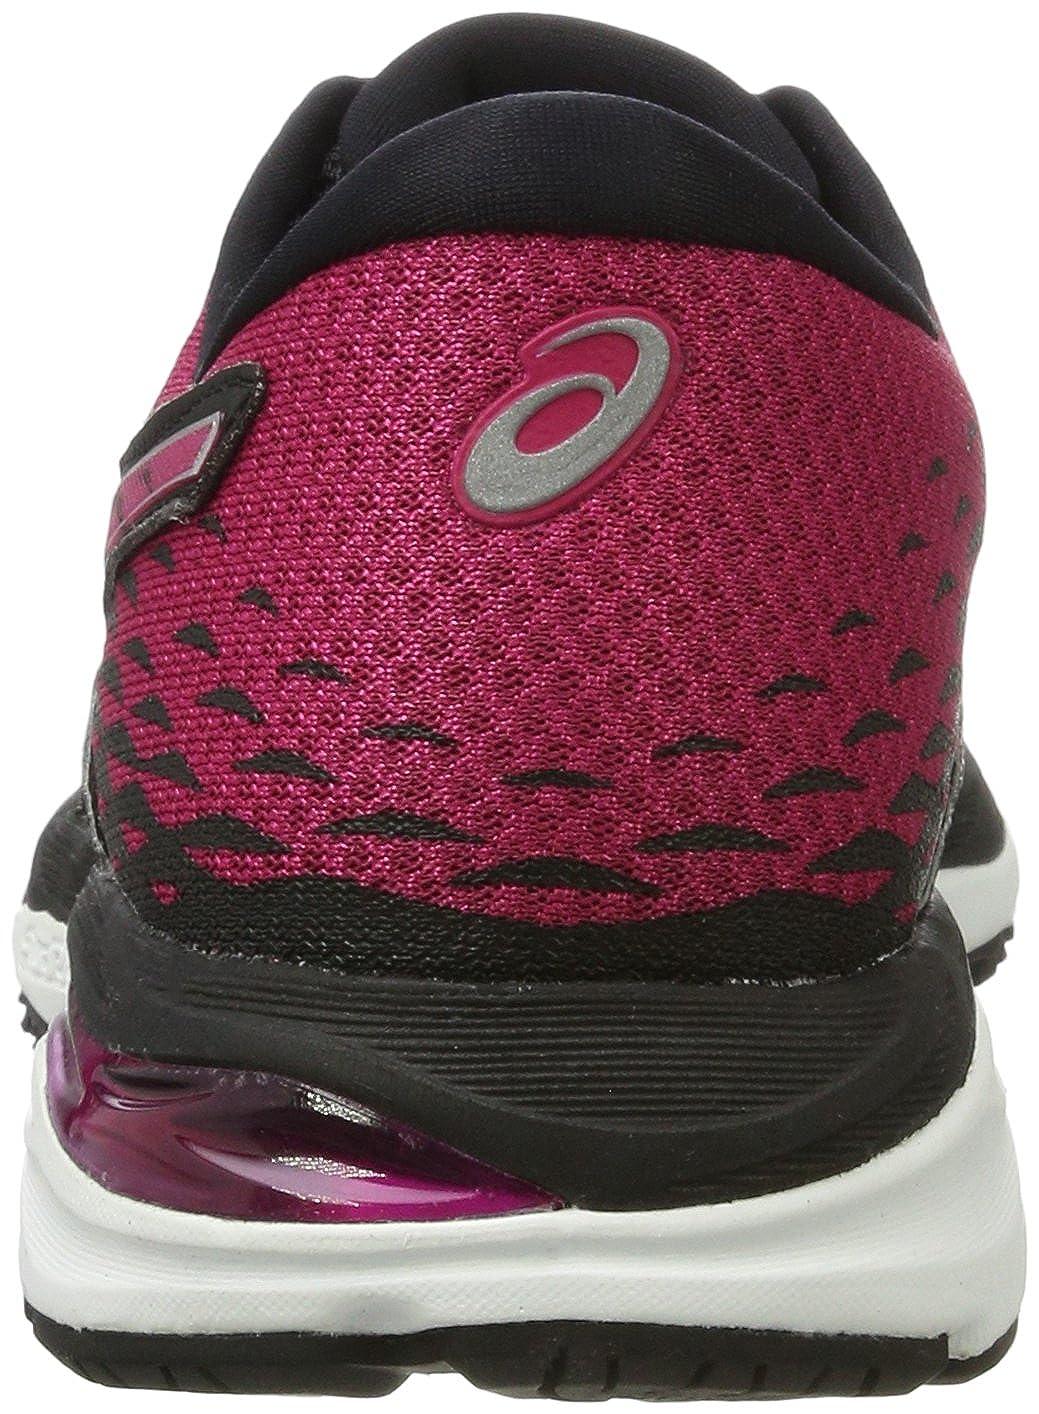 Amazon.com | Asics Gel Cumulus 19 Womens Running Shoes - Black-4.5 | Road Running